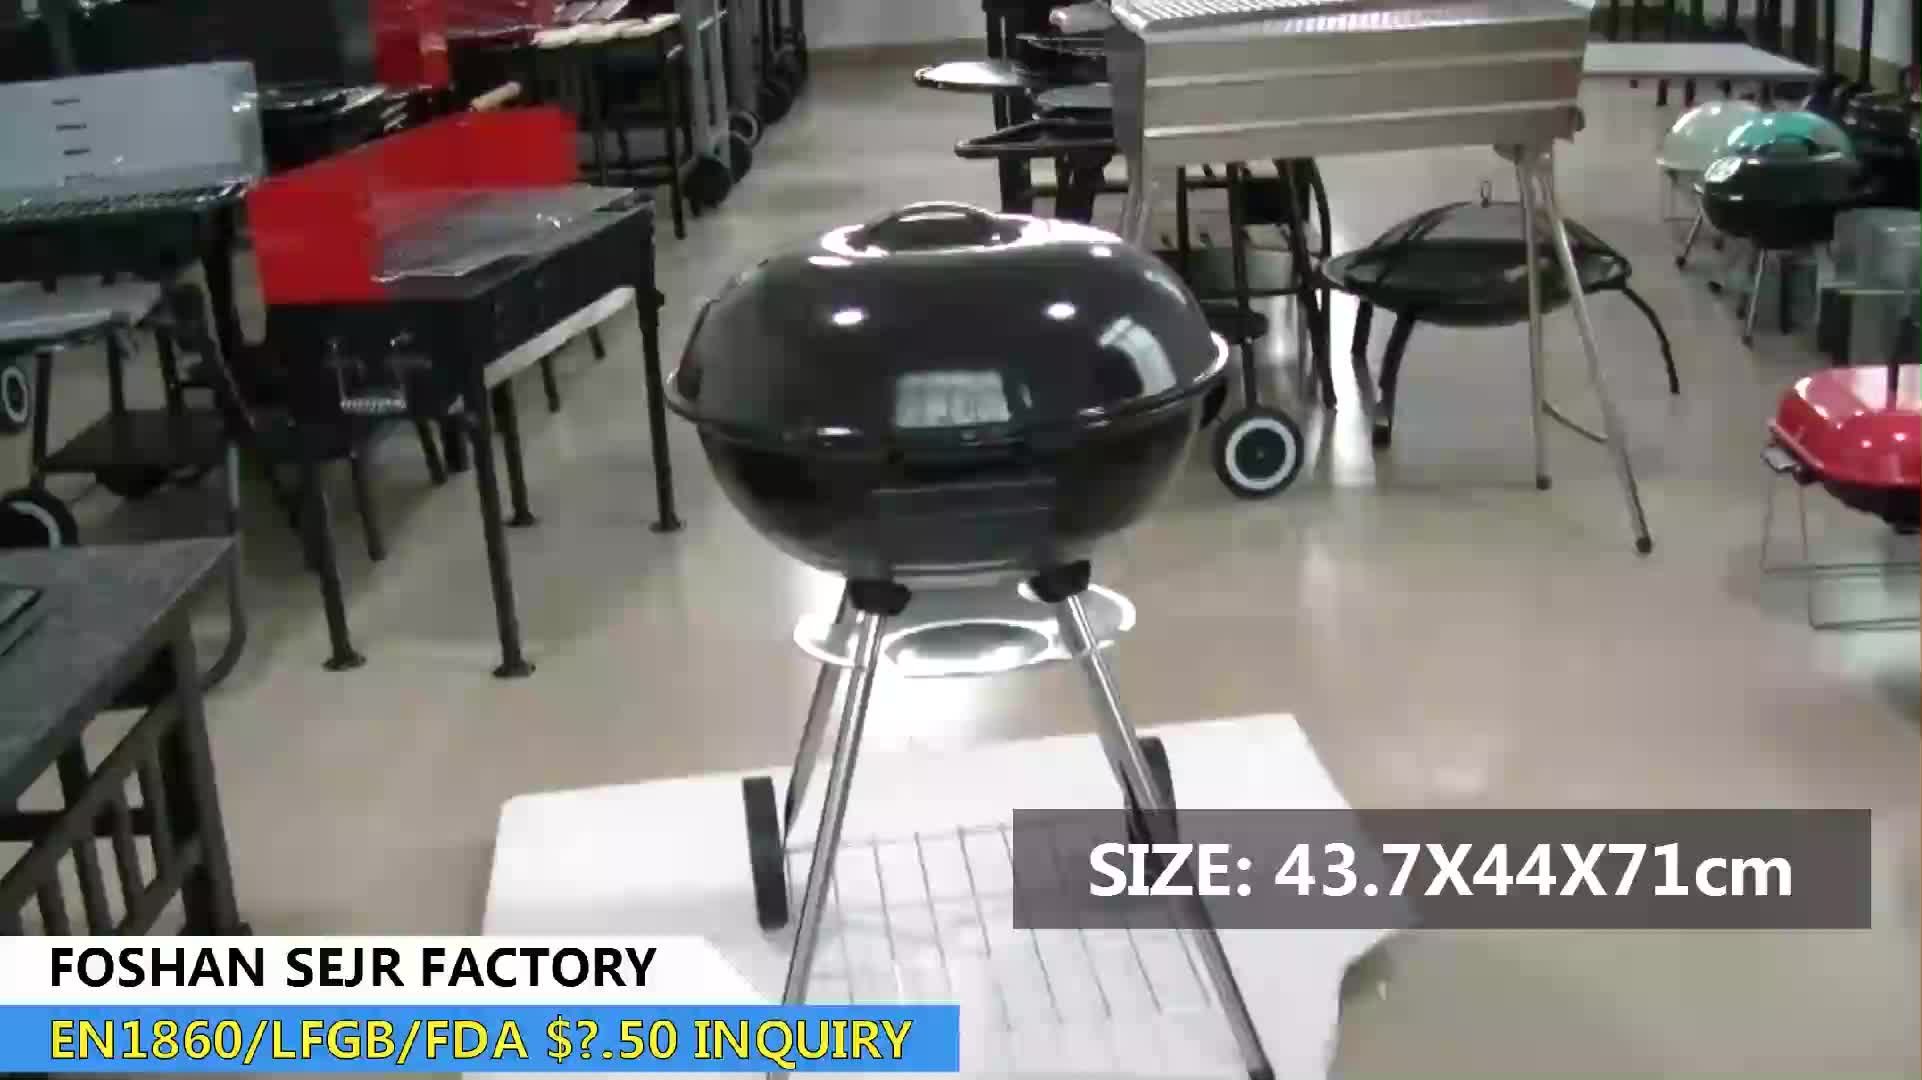 SEJR 17 Inch Zwarte Houtskool Ketel BBQ Grill Weber Barbecue Grill 43.7X44X71 cm